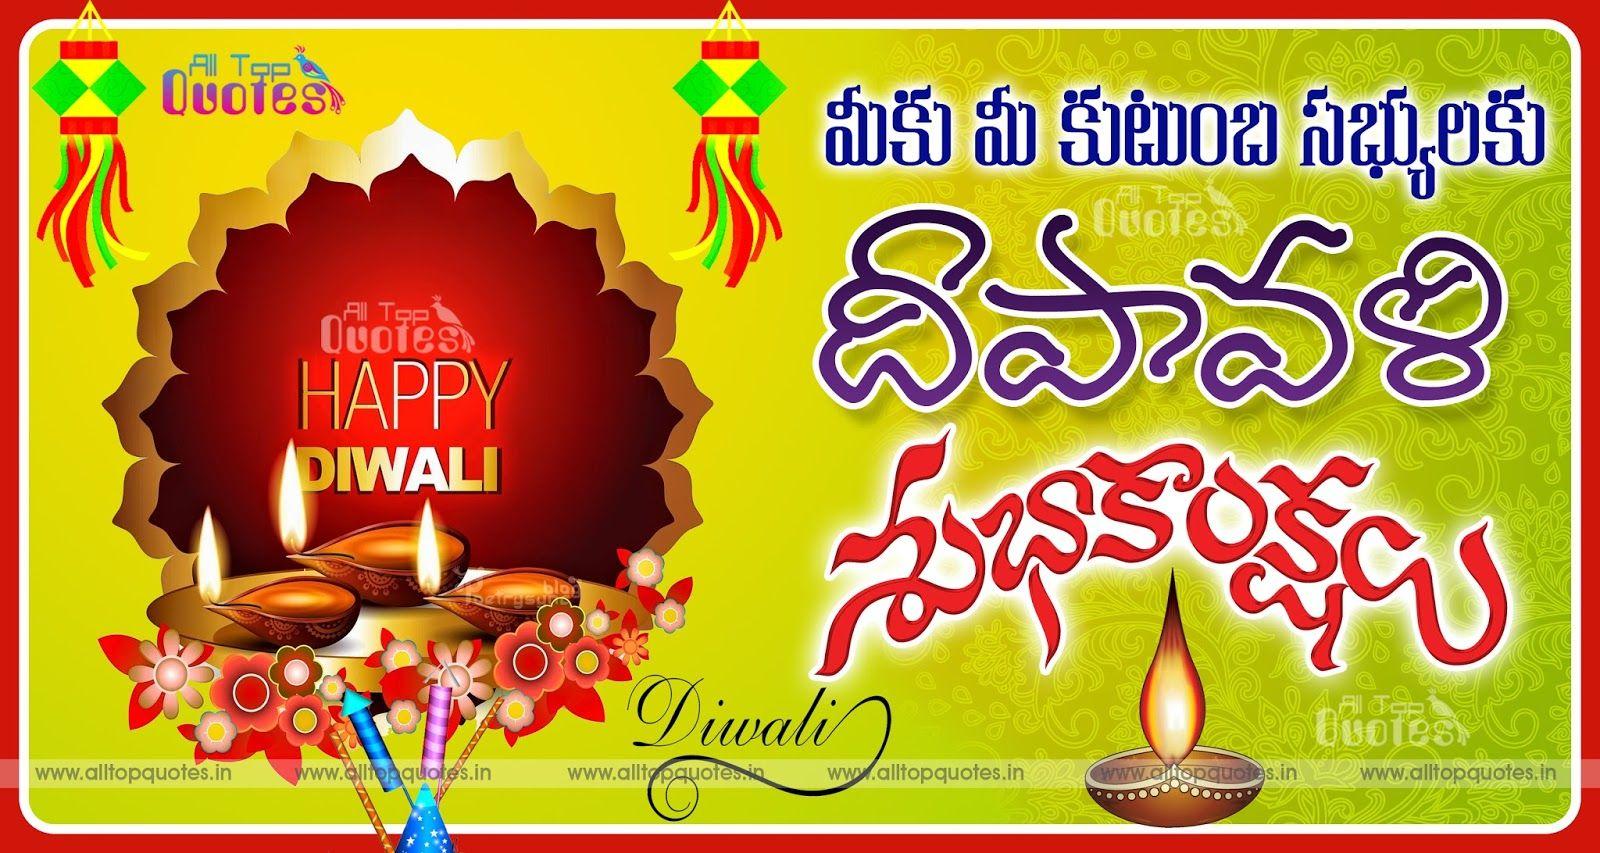 Deepavali telugu quotes and messages online top telugu diwali deepavali telugu quotes and messages online top telugu diwali wishes and quotations onlinehappy kristyandbryce Gallery